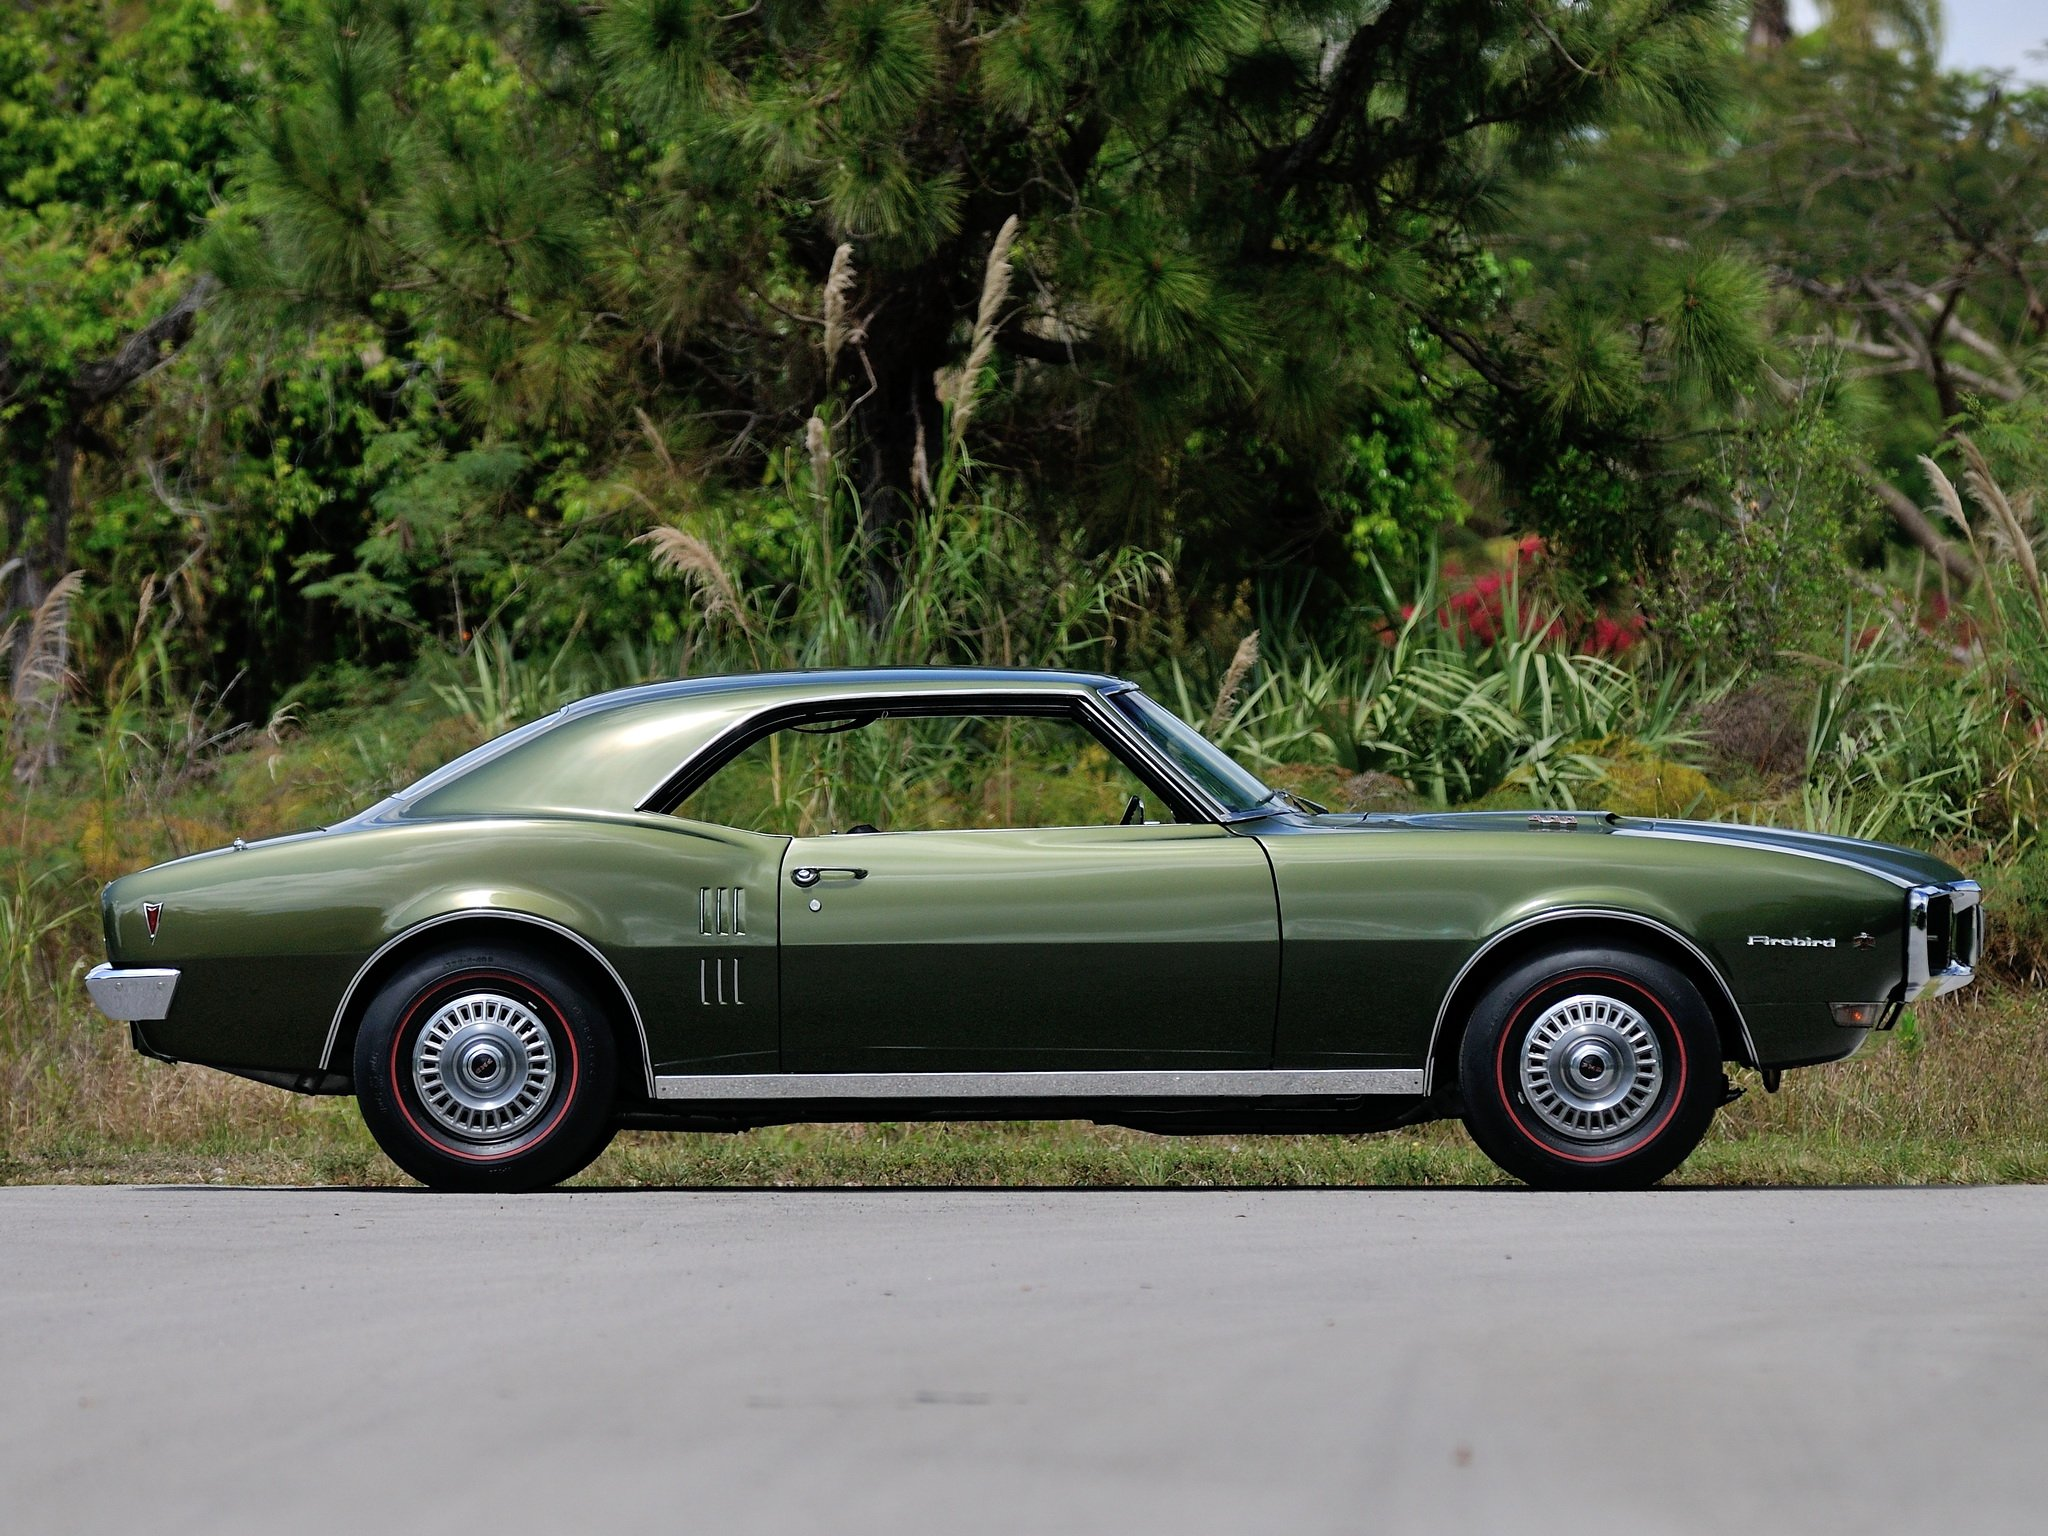 1968 Pontiac Firebird 400 L67 Ram Air I I 2337 muscle classic y 2048x1536